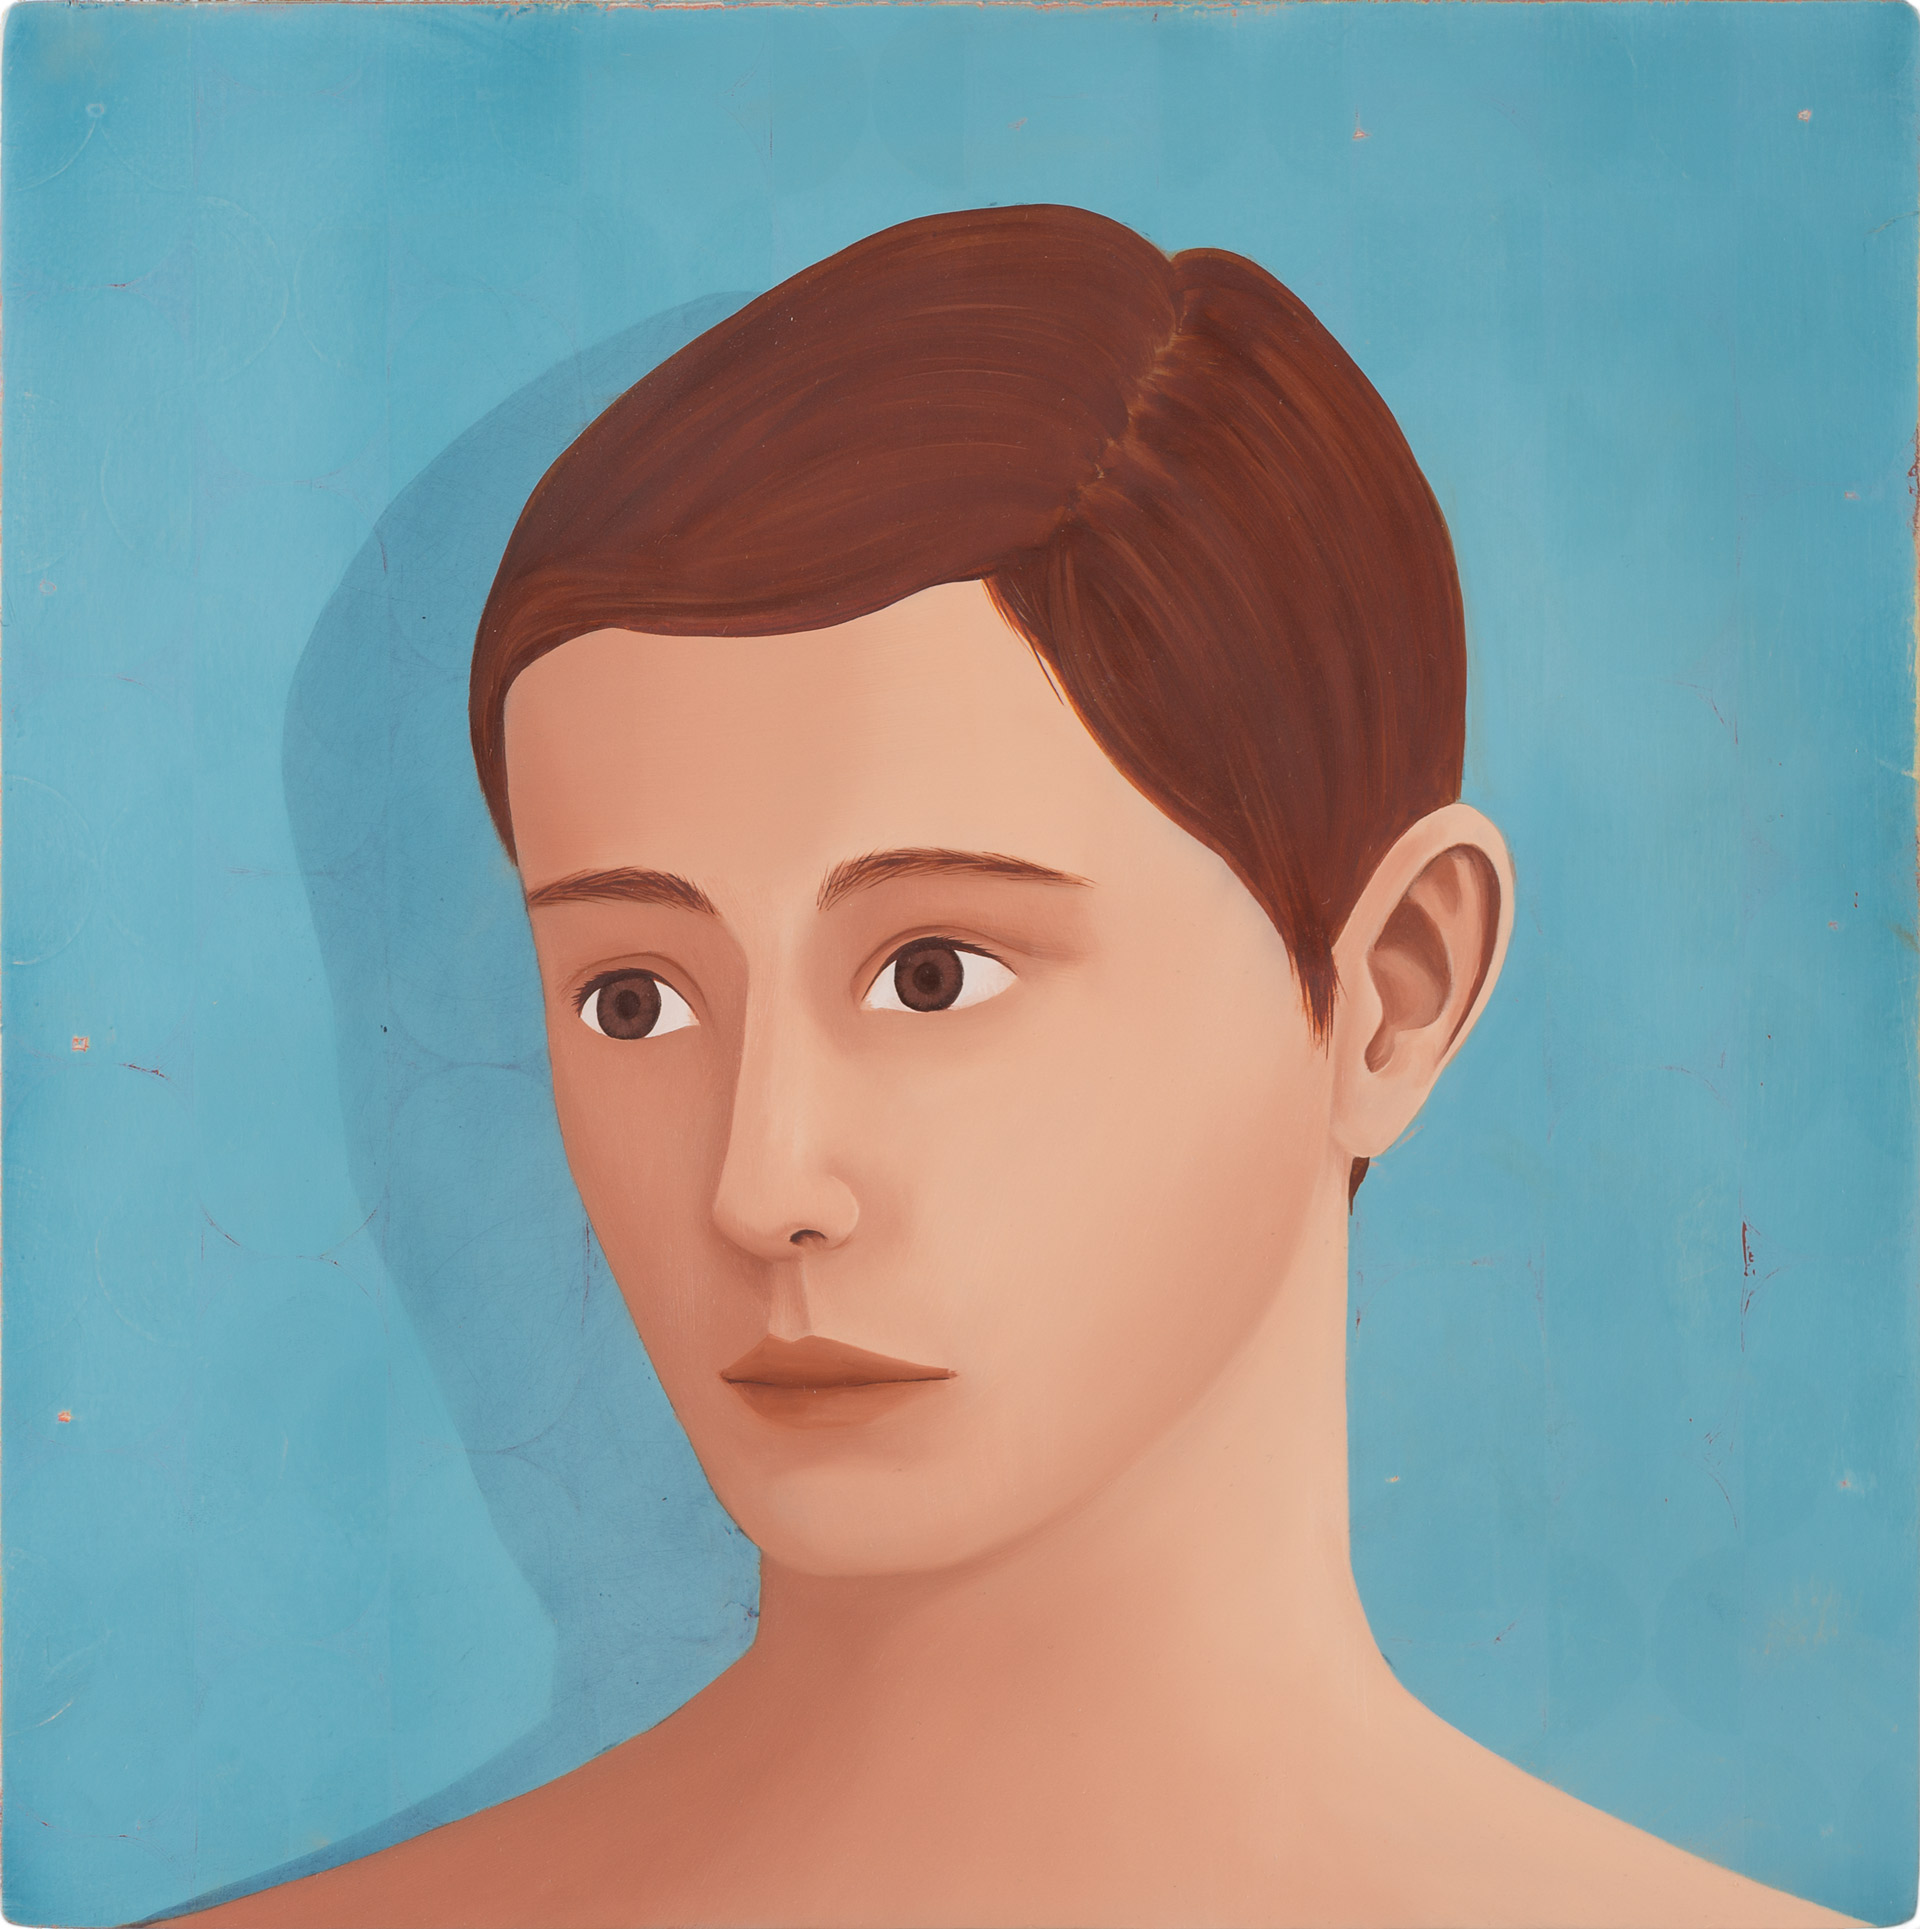 Untitled/30 x 30 cm, Oil on wood/2019